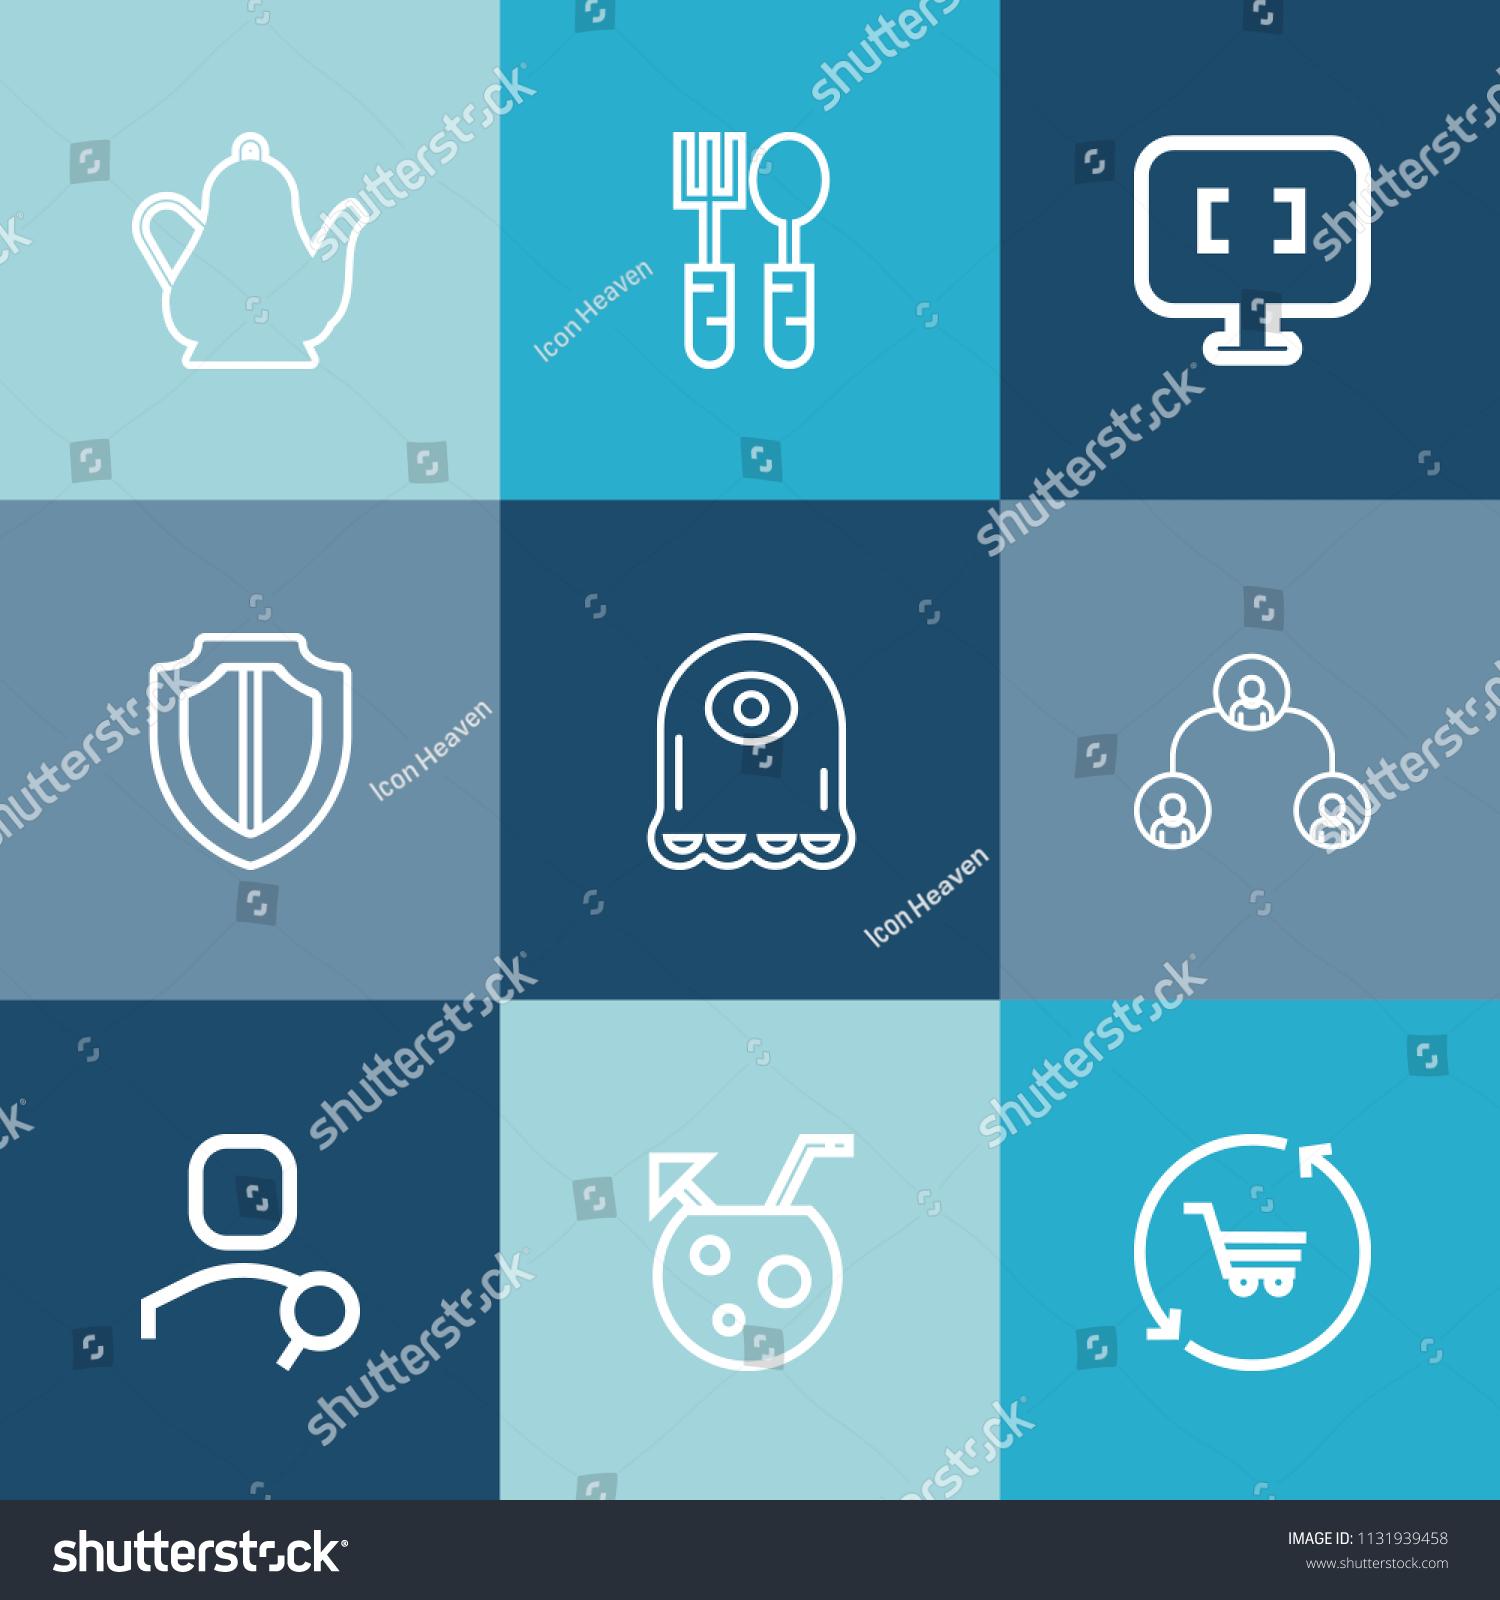 Modern Simple Vector Icon Set On Stock Vector 1131939458 - Shutterstock